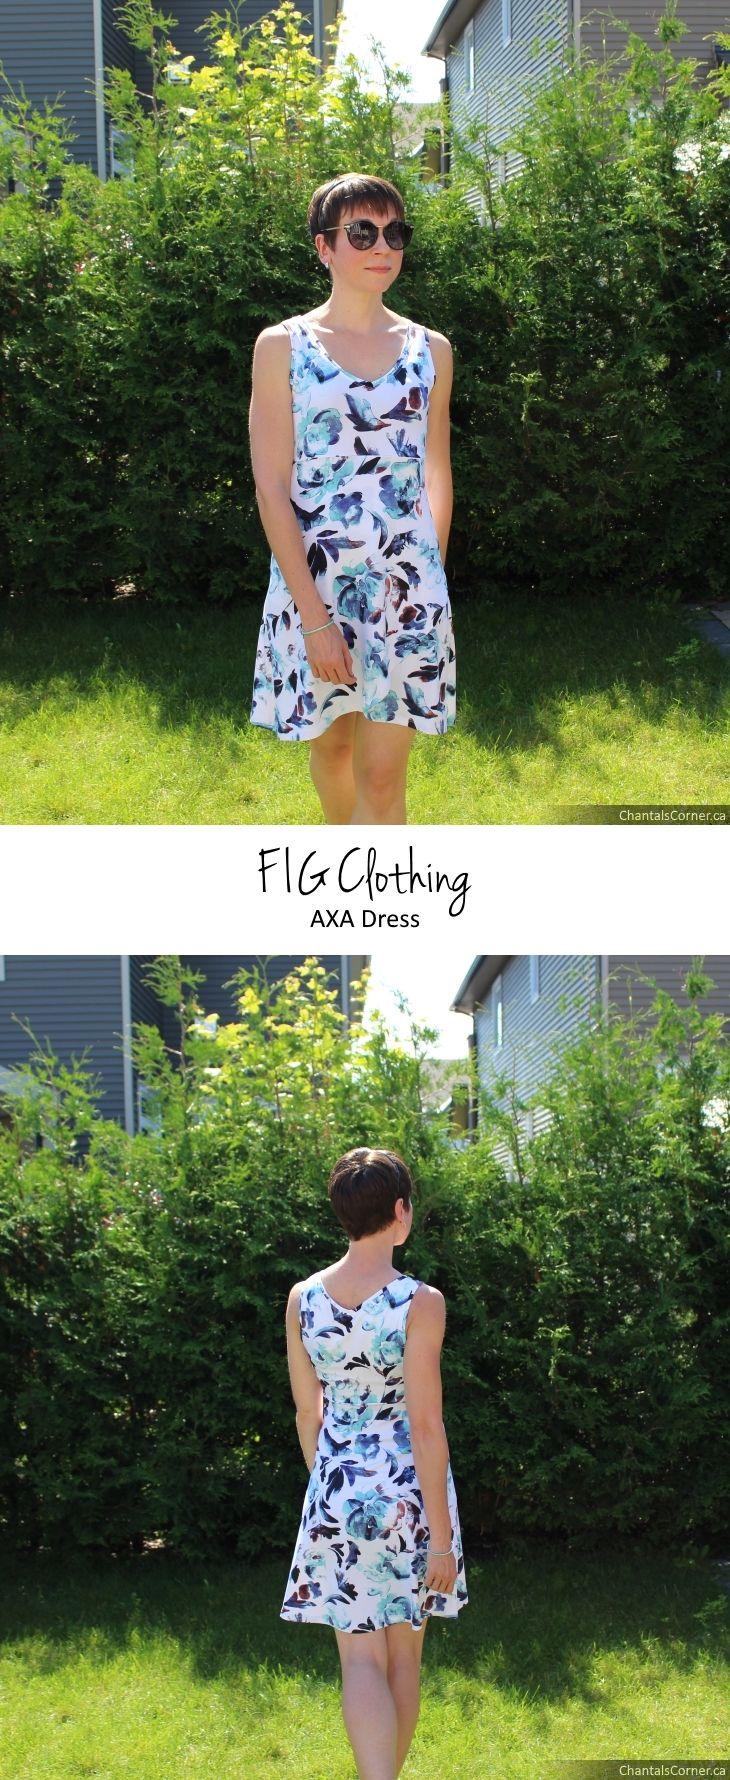 FIG Clothing AXA dress Ocean collection